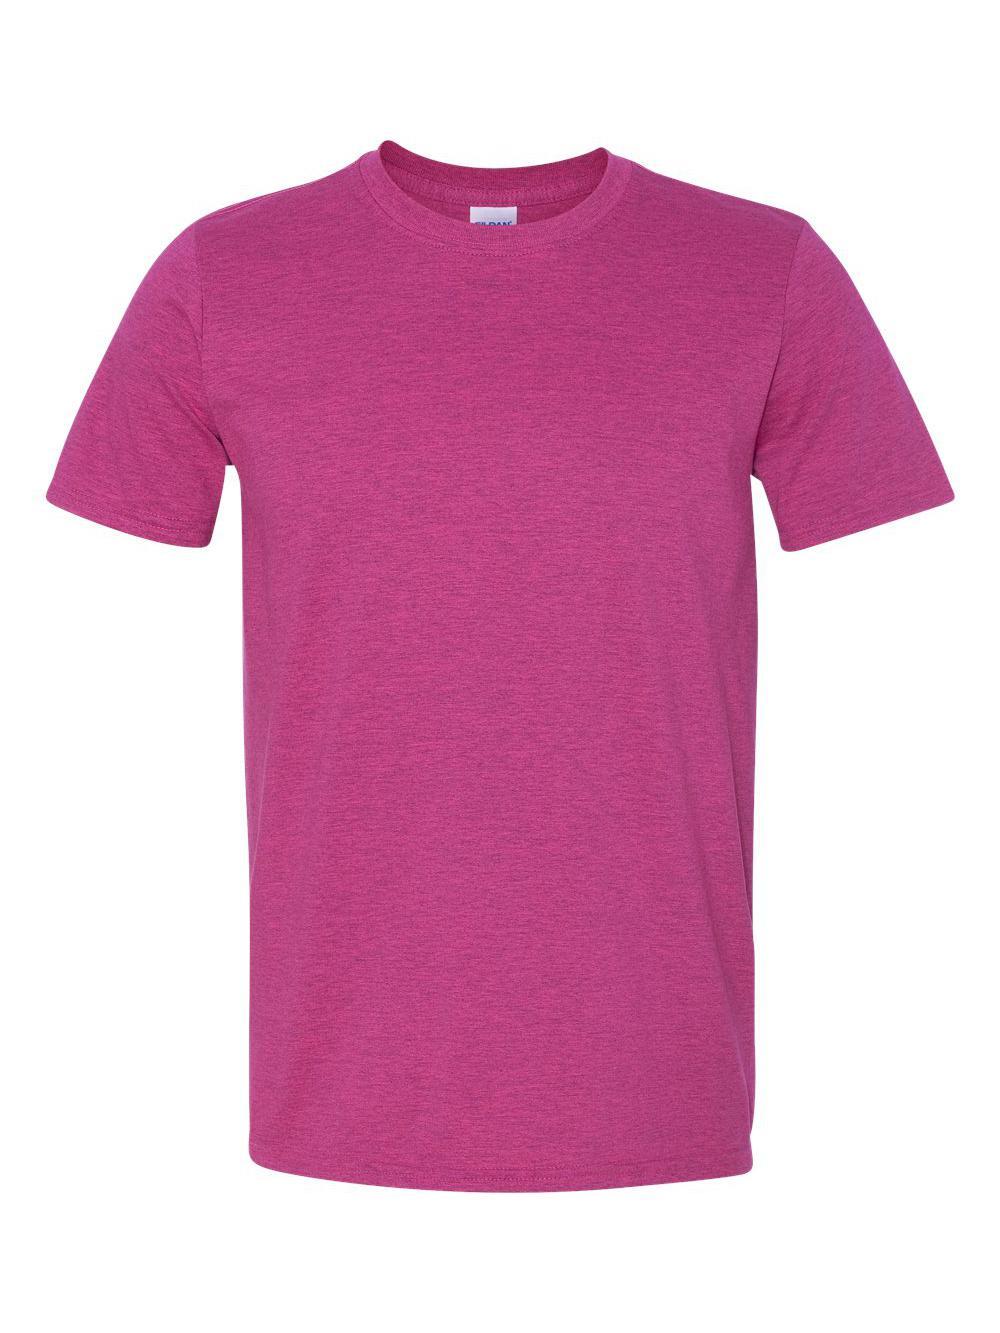 Gildan-Softstyle-T-Shirt-64000 thumbnail 6